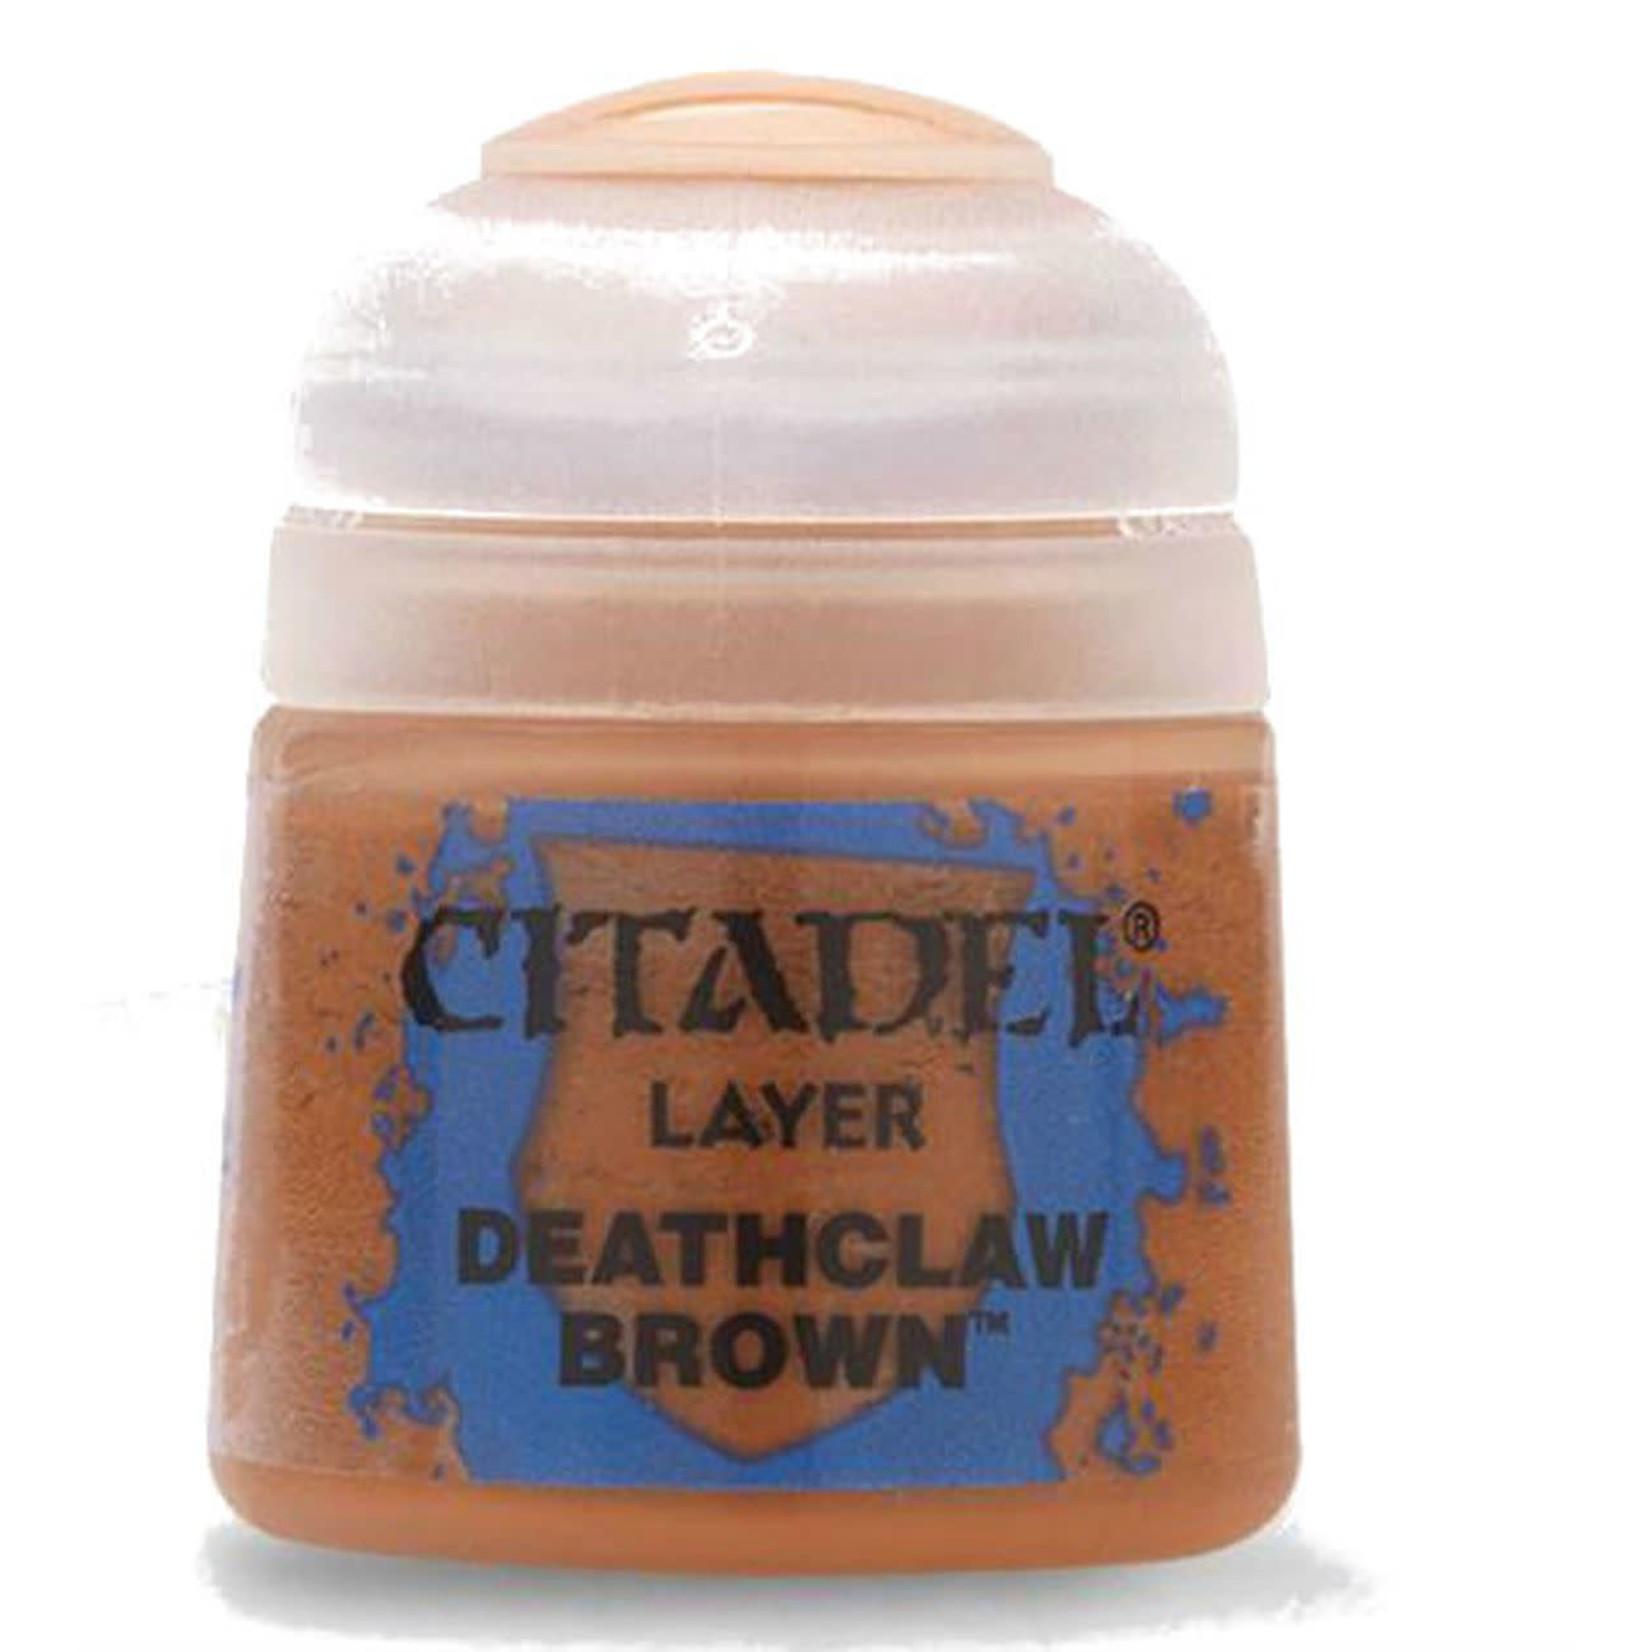 Games Workshop Citadel Paint: Deathclaw Brown 12ml